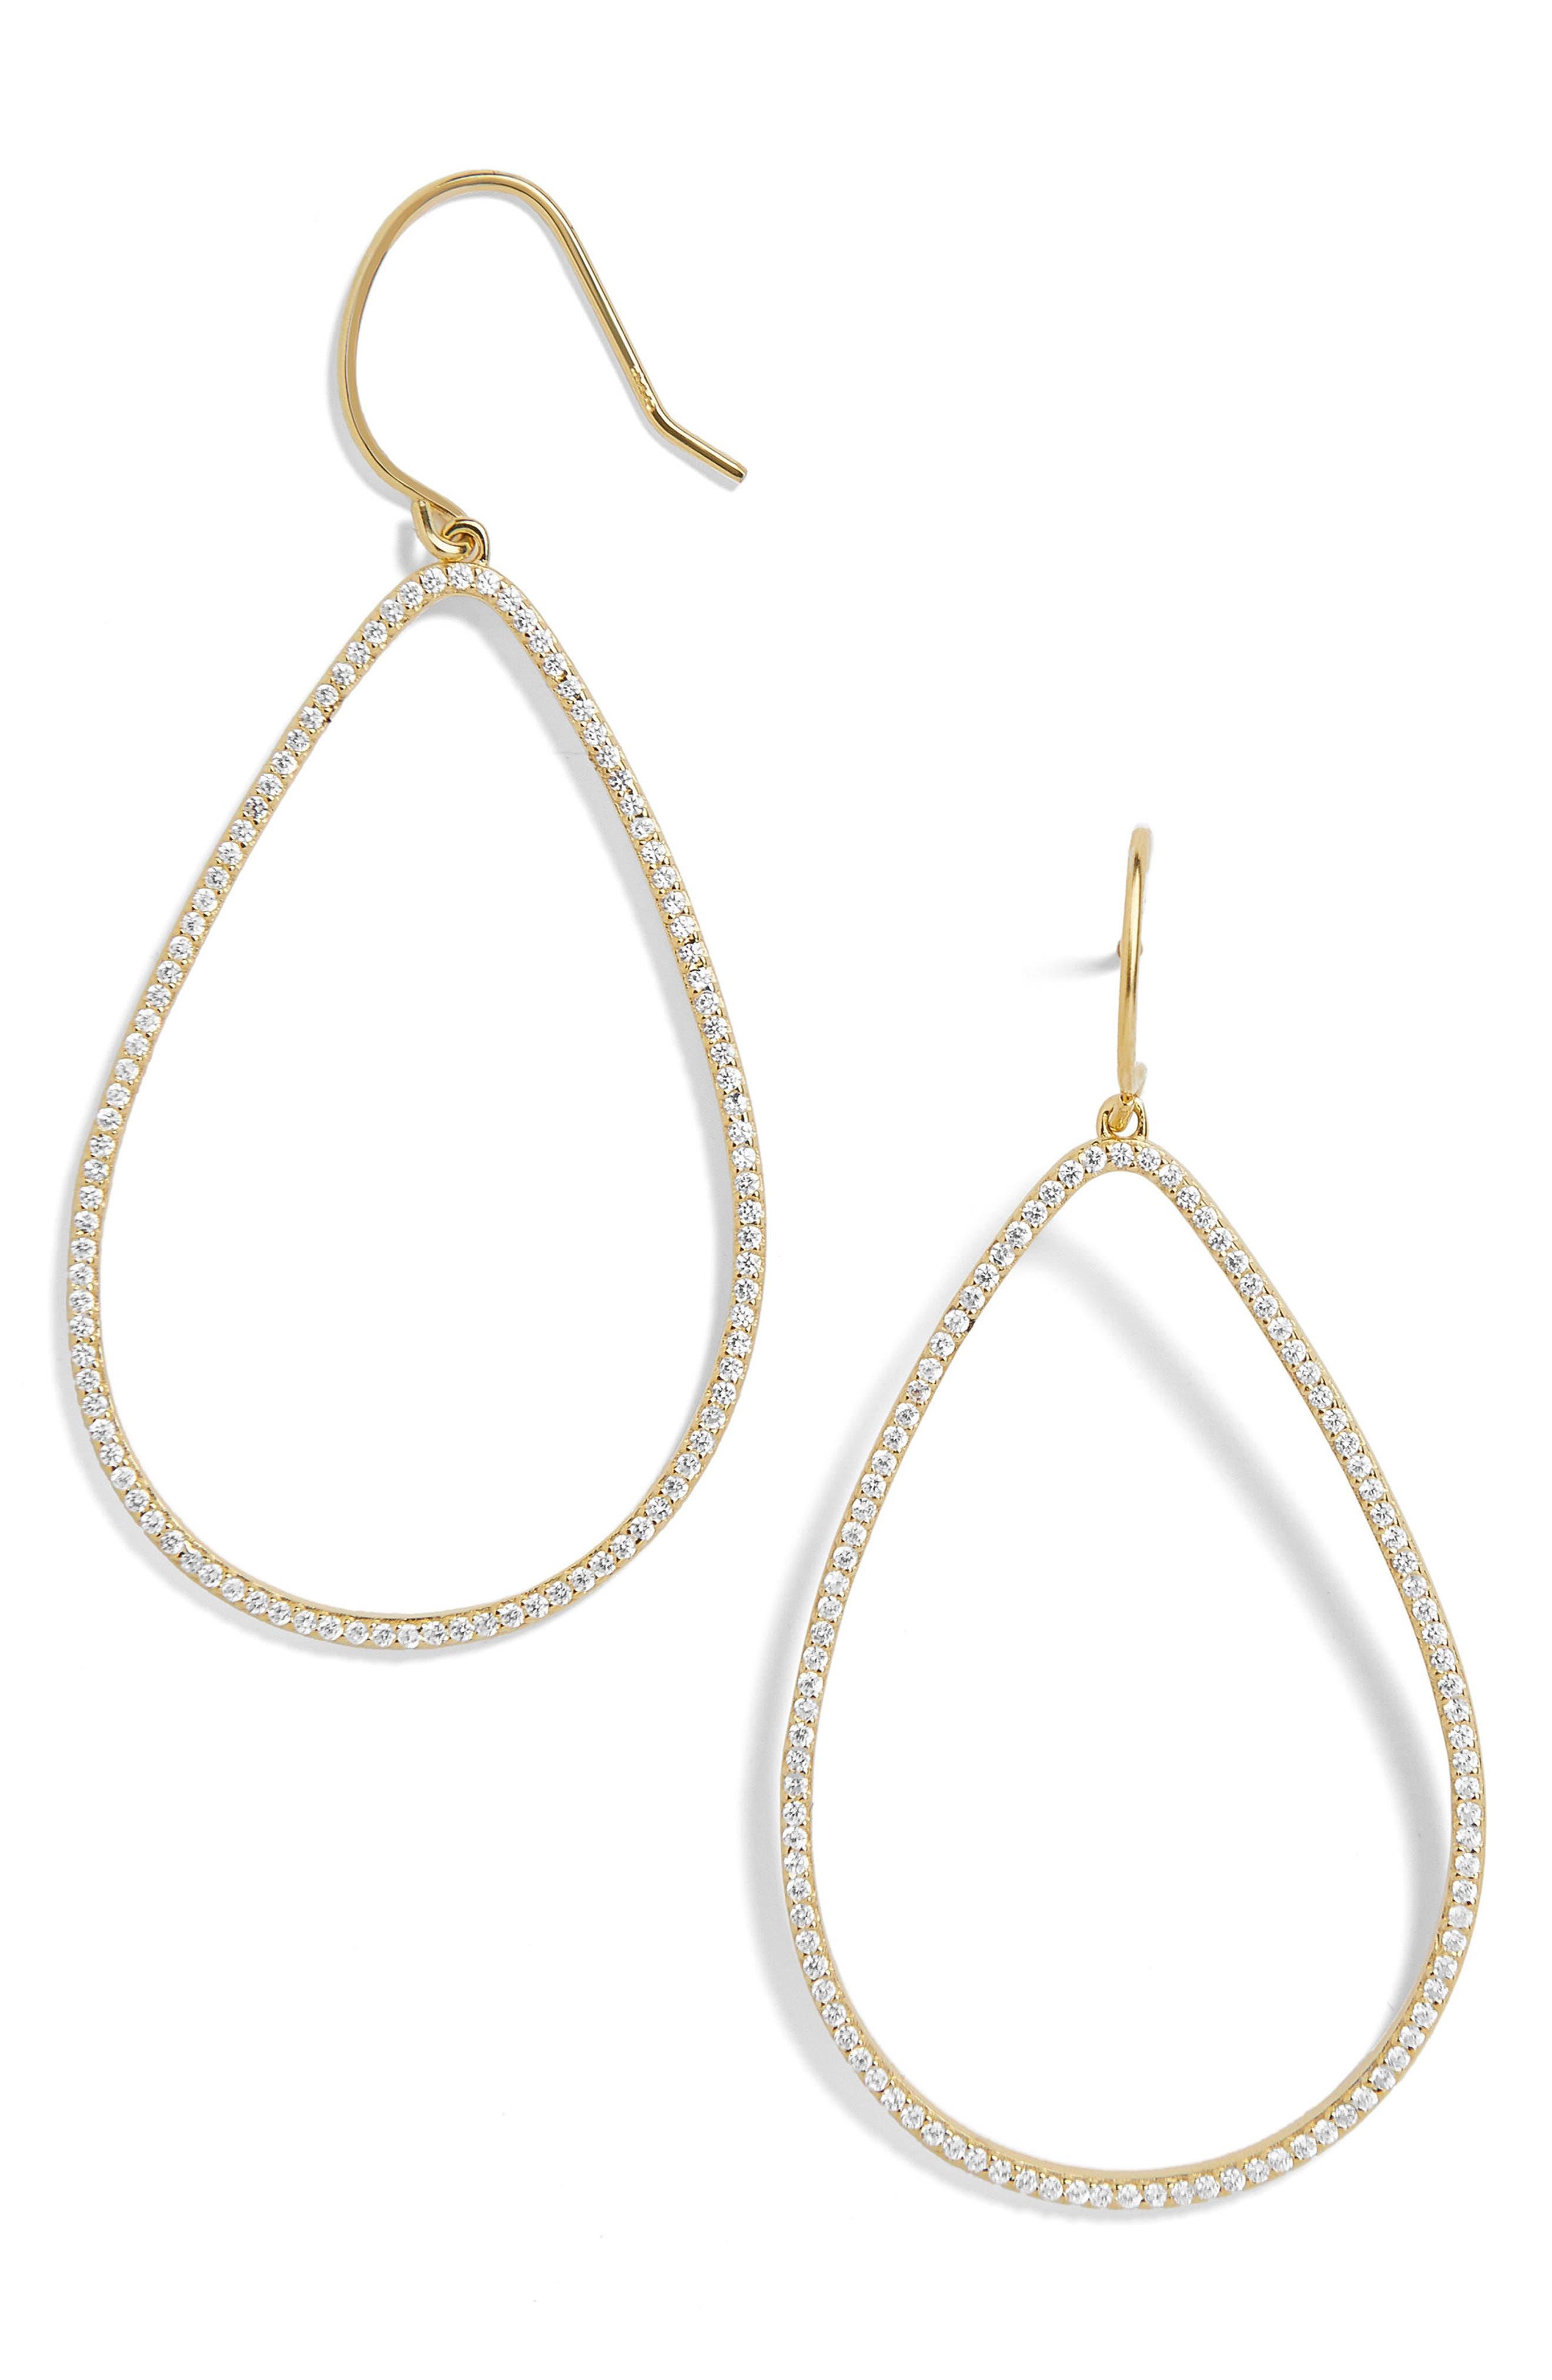 Everyday Fine Fishhook Crystal Teardrop Earrings,                         Main,                         color, GOLD